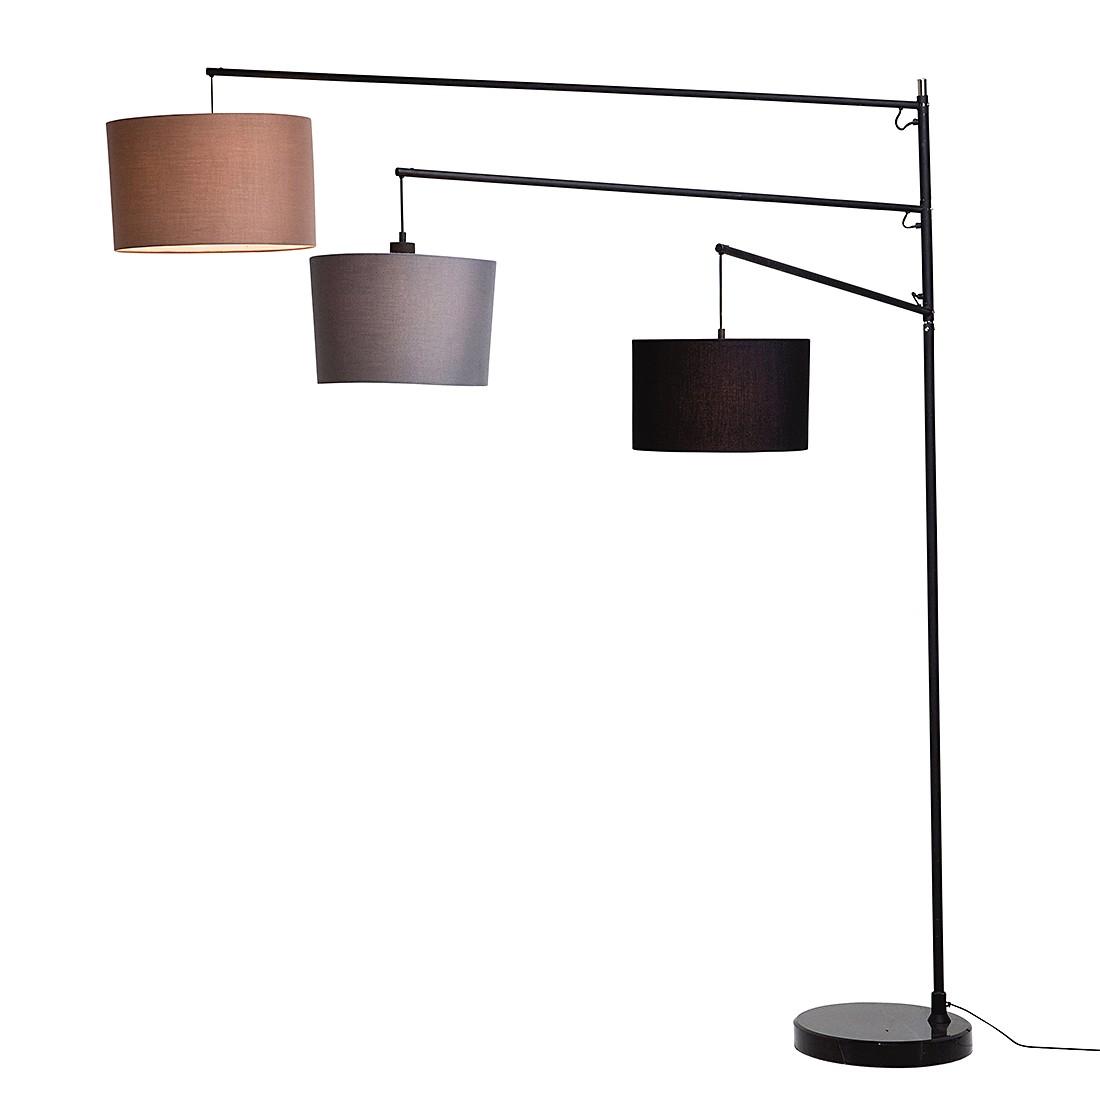 Lemming Tree Vloerlamp Kare Design Kare Design Aanbieding Kopen Lage Prijs